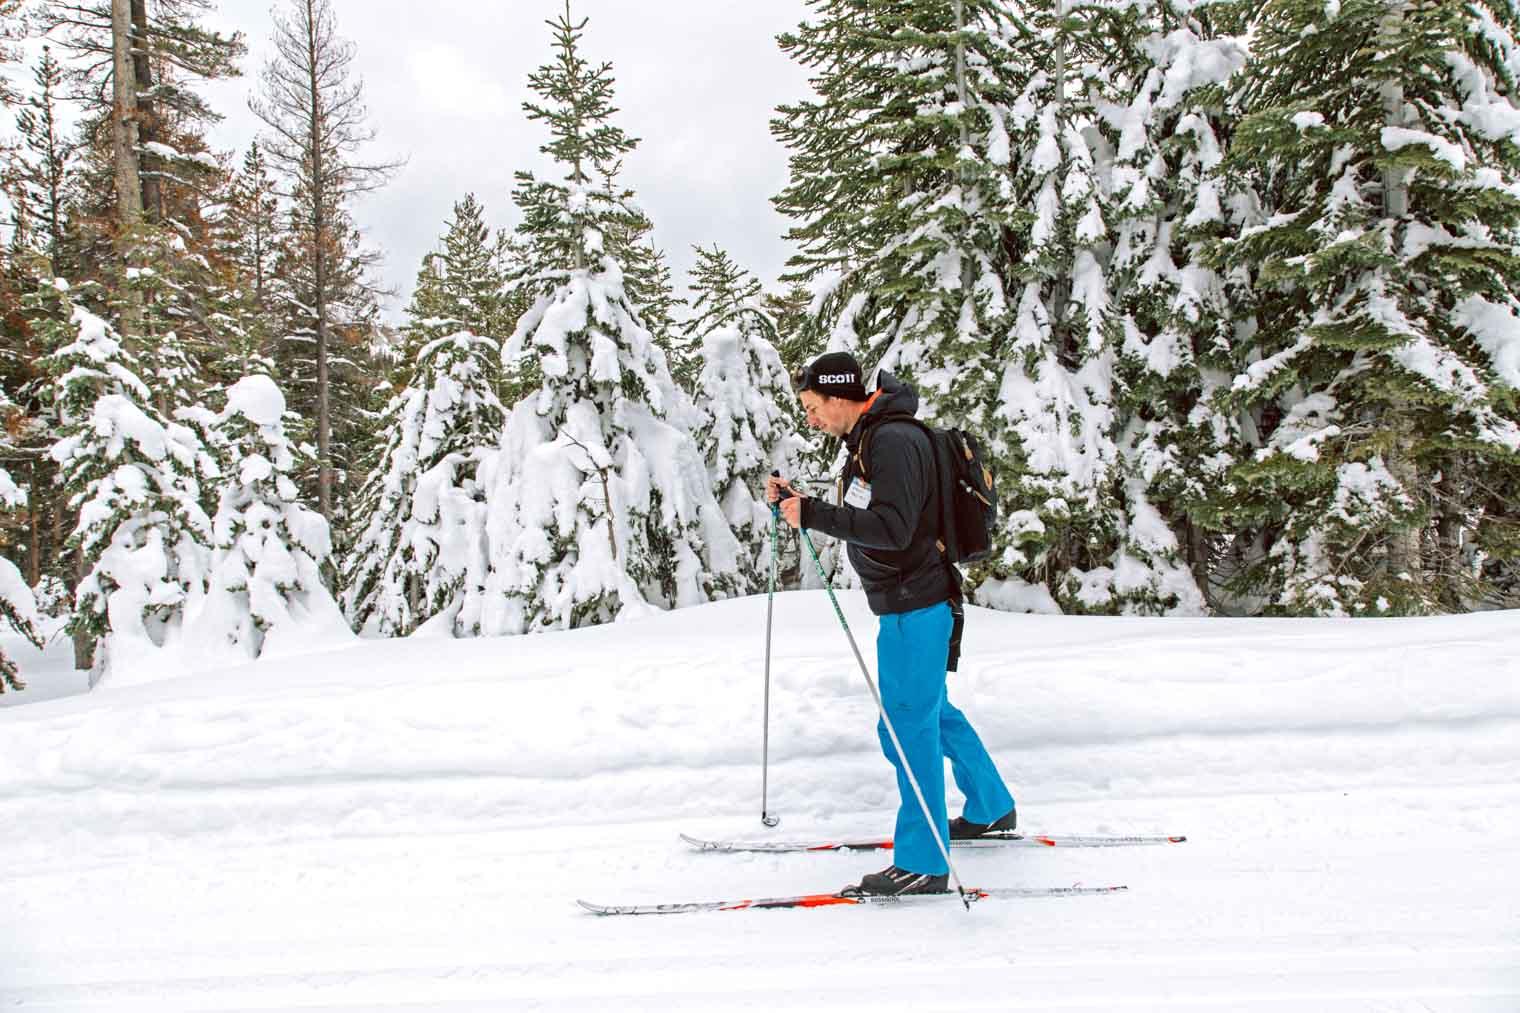 Michael cross country skiing